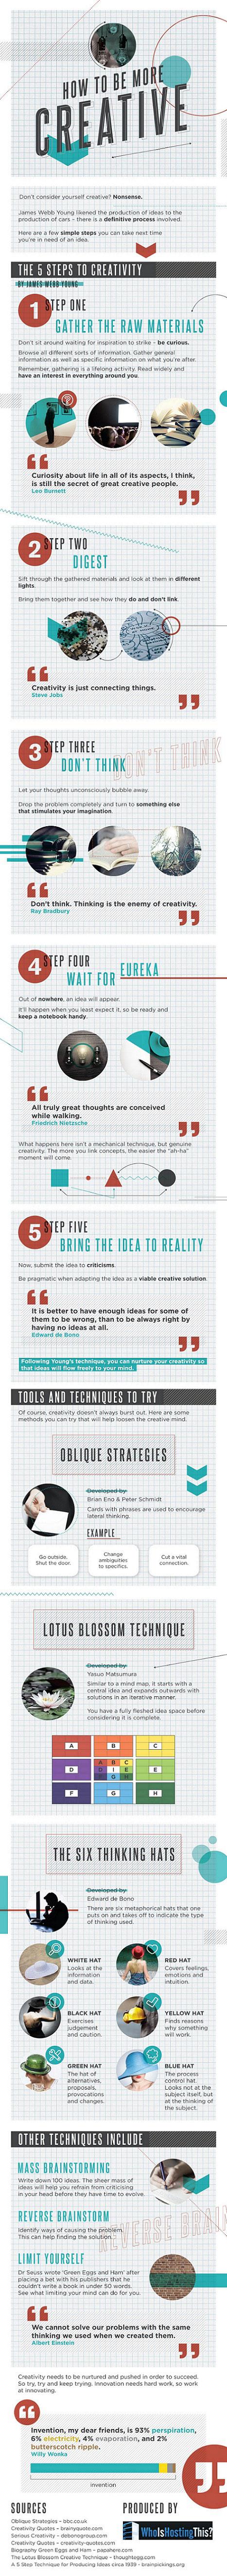 Boost Creativity-Infographic